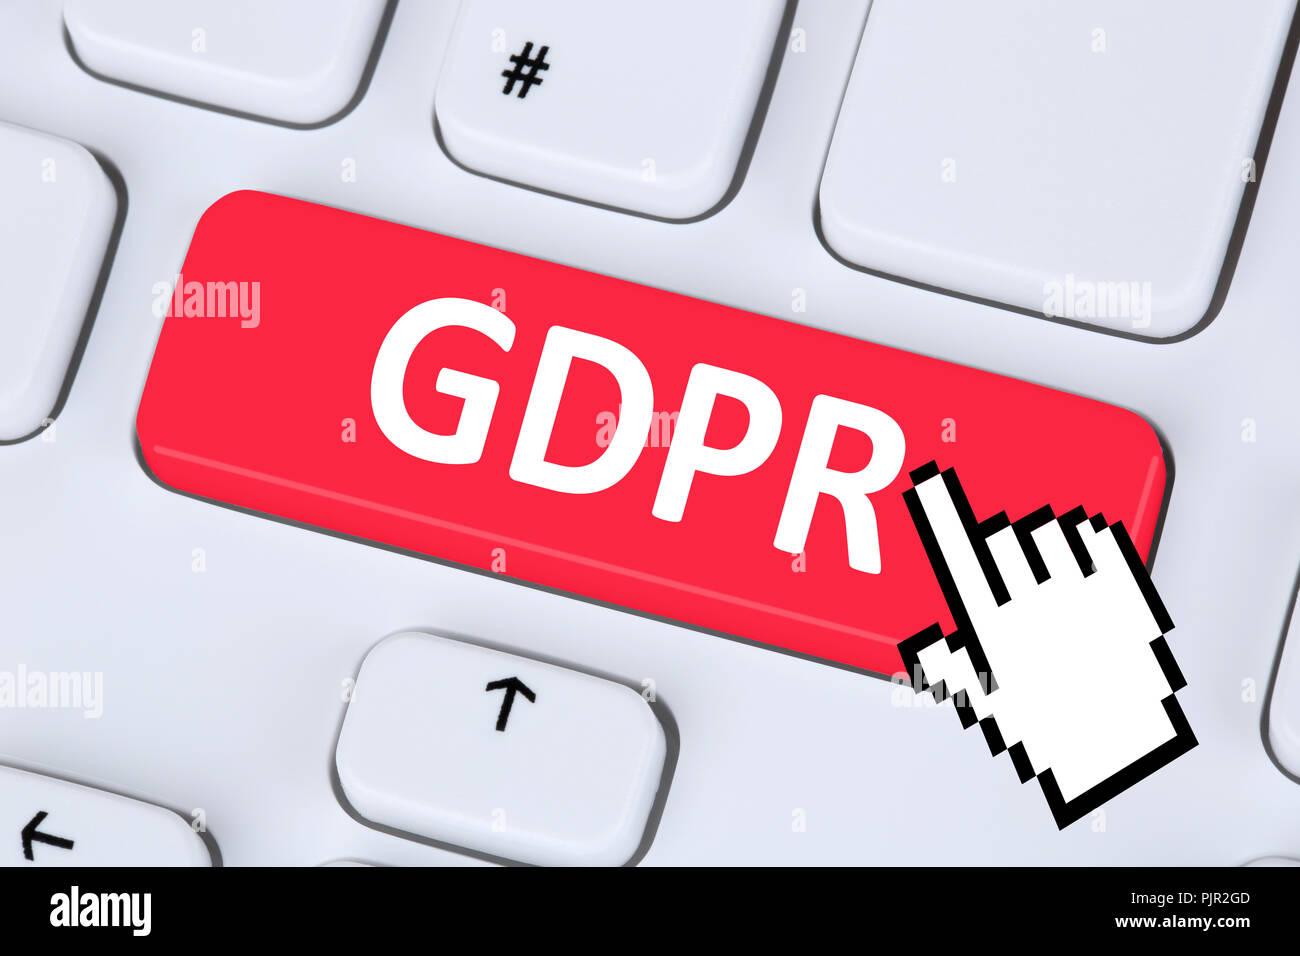 GDPR General Data Protection Regulation EU European Union websites internet online computer - Stock Image